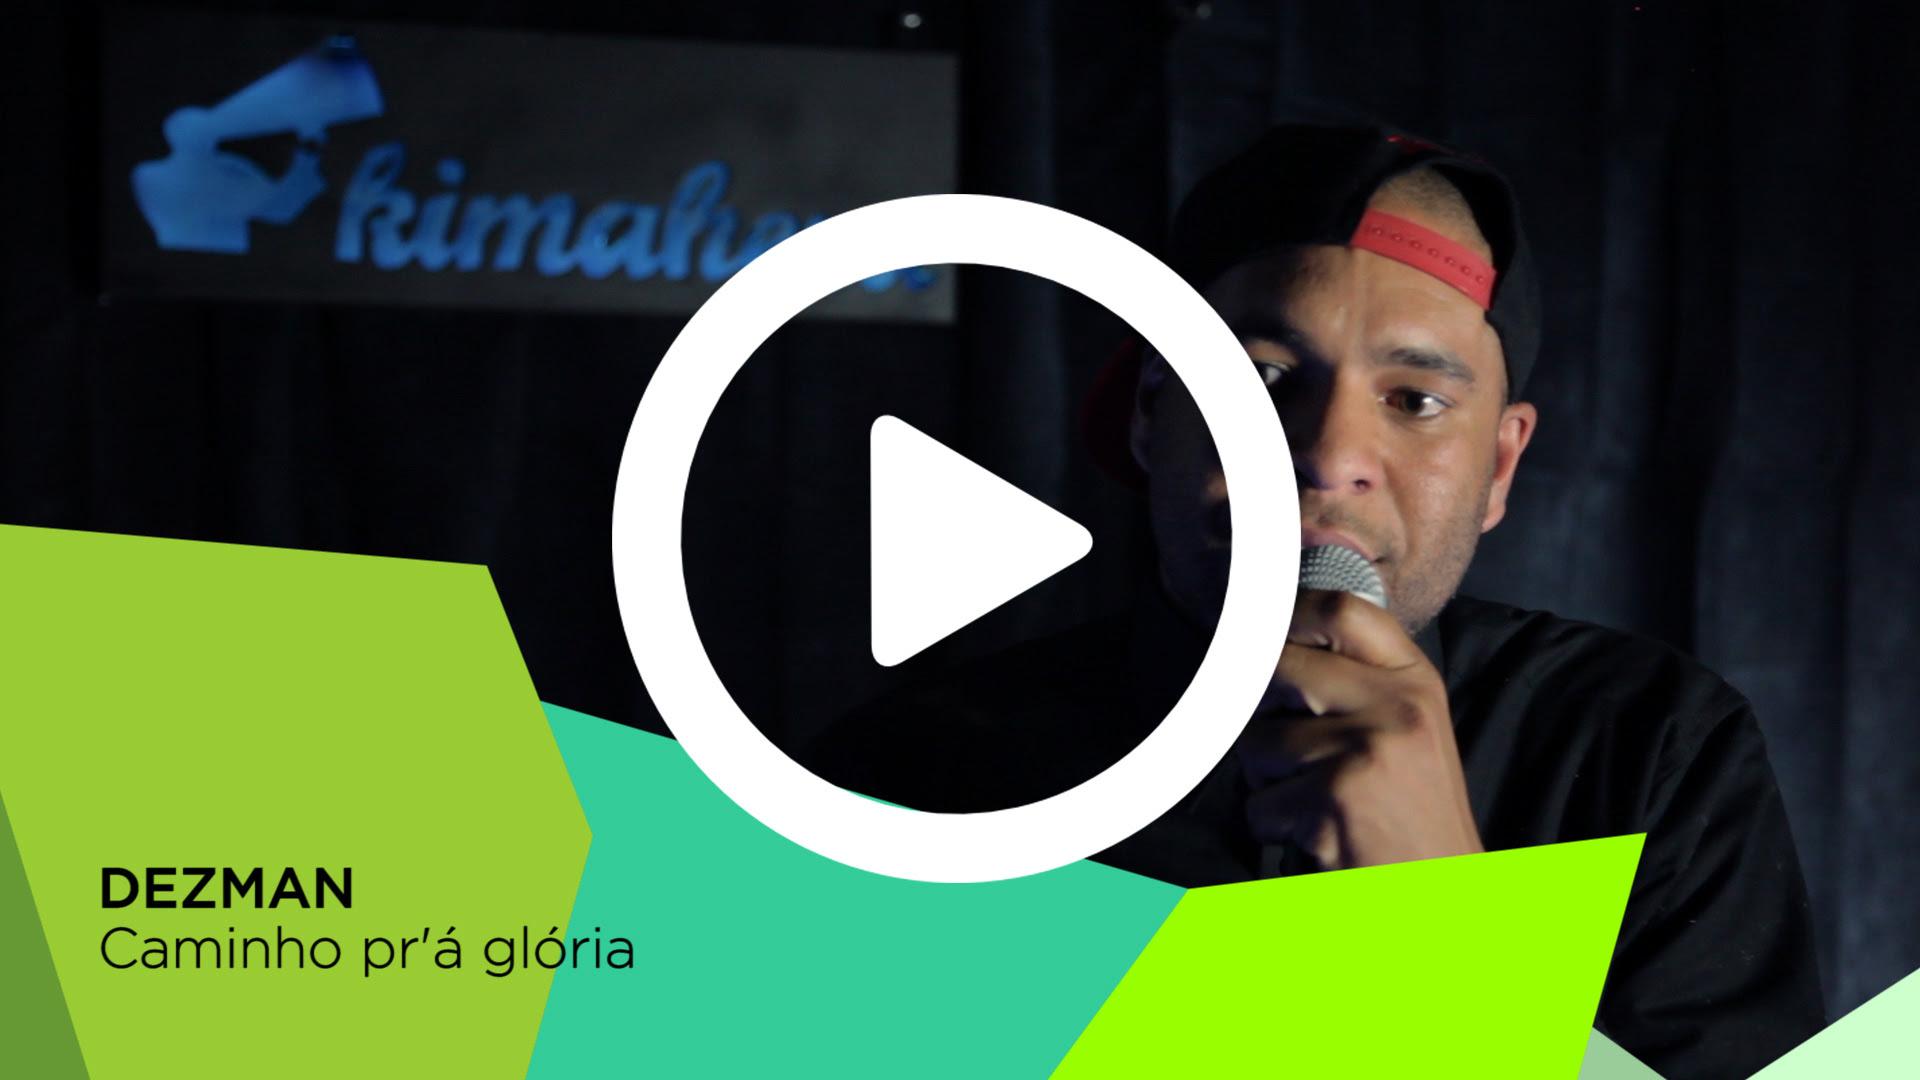 #KimaheraSections - Dezman - Abril'16 #1